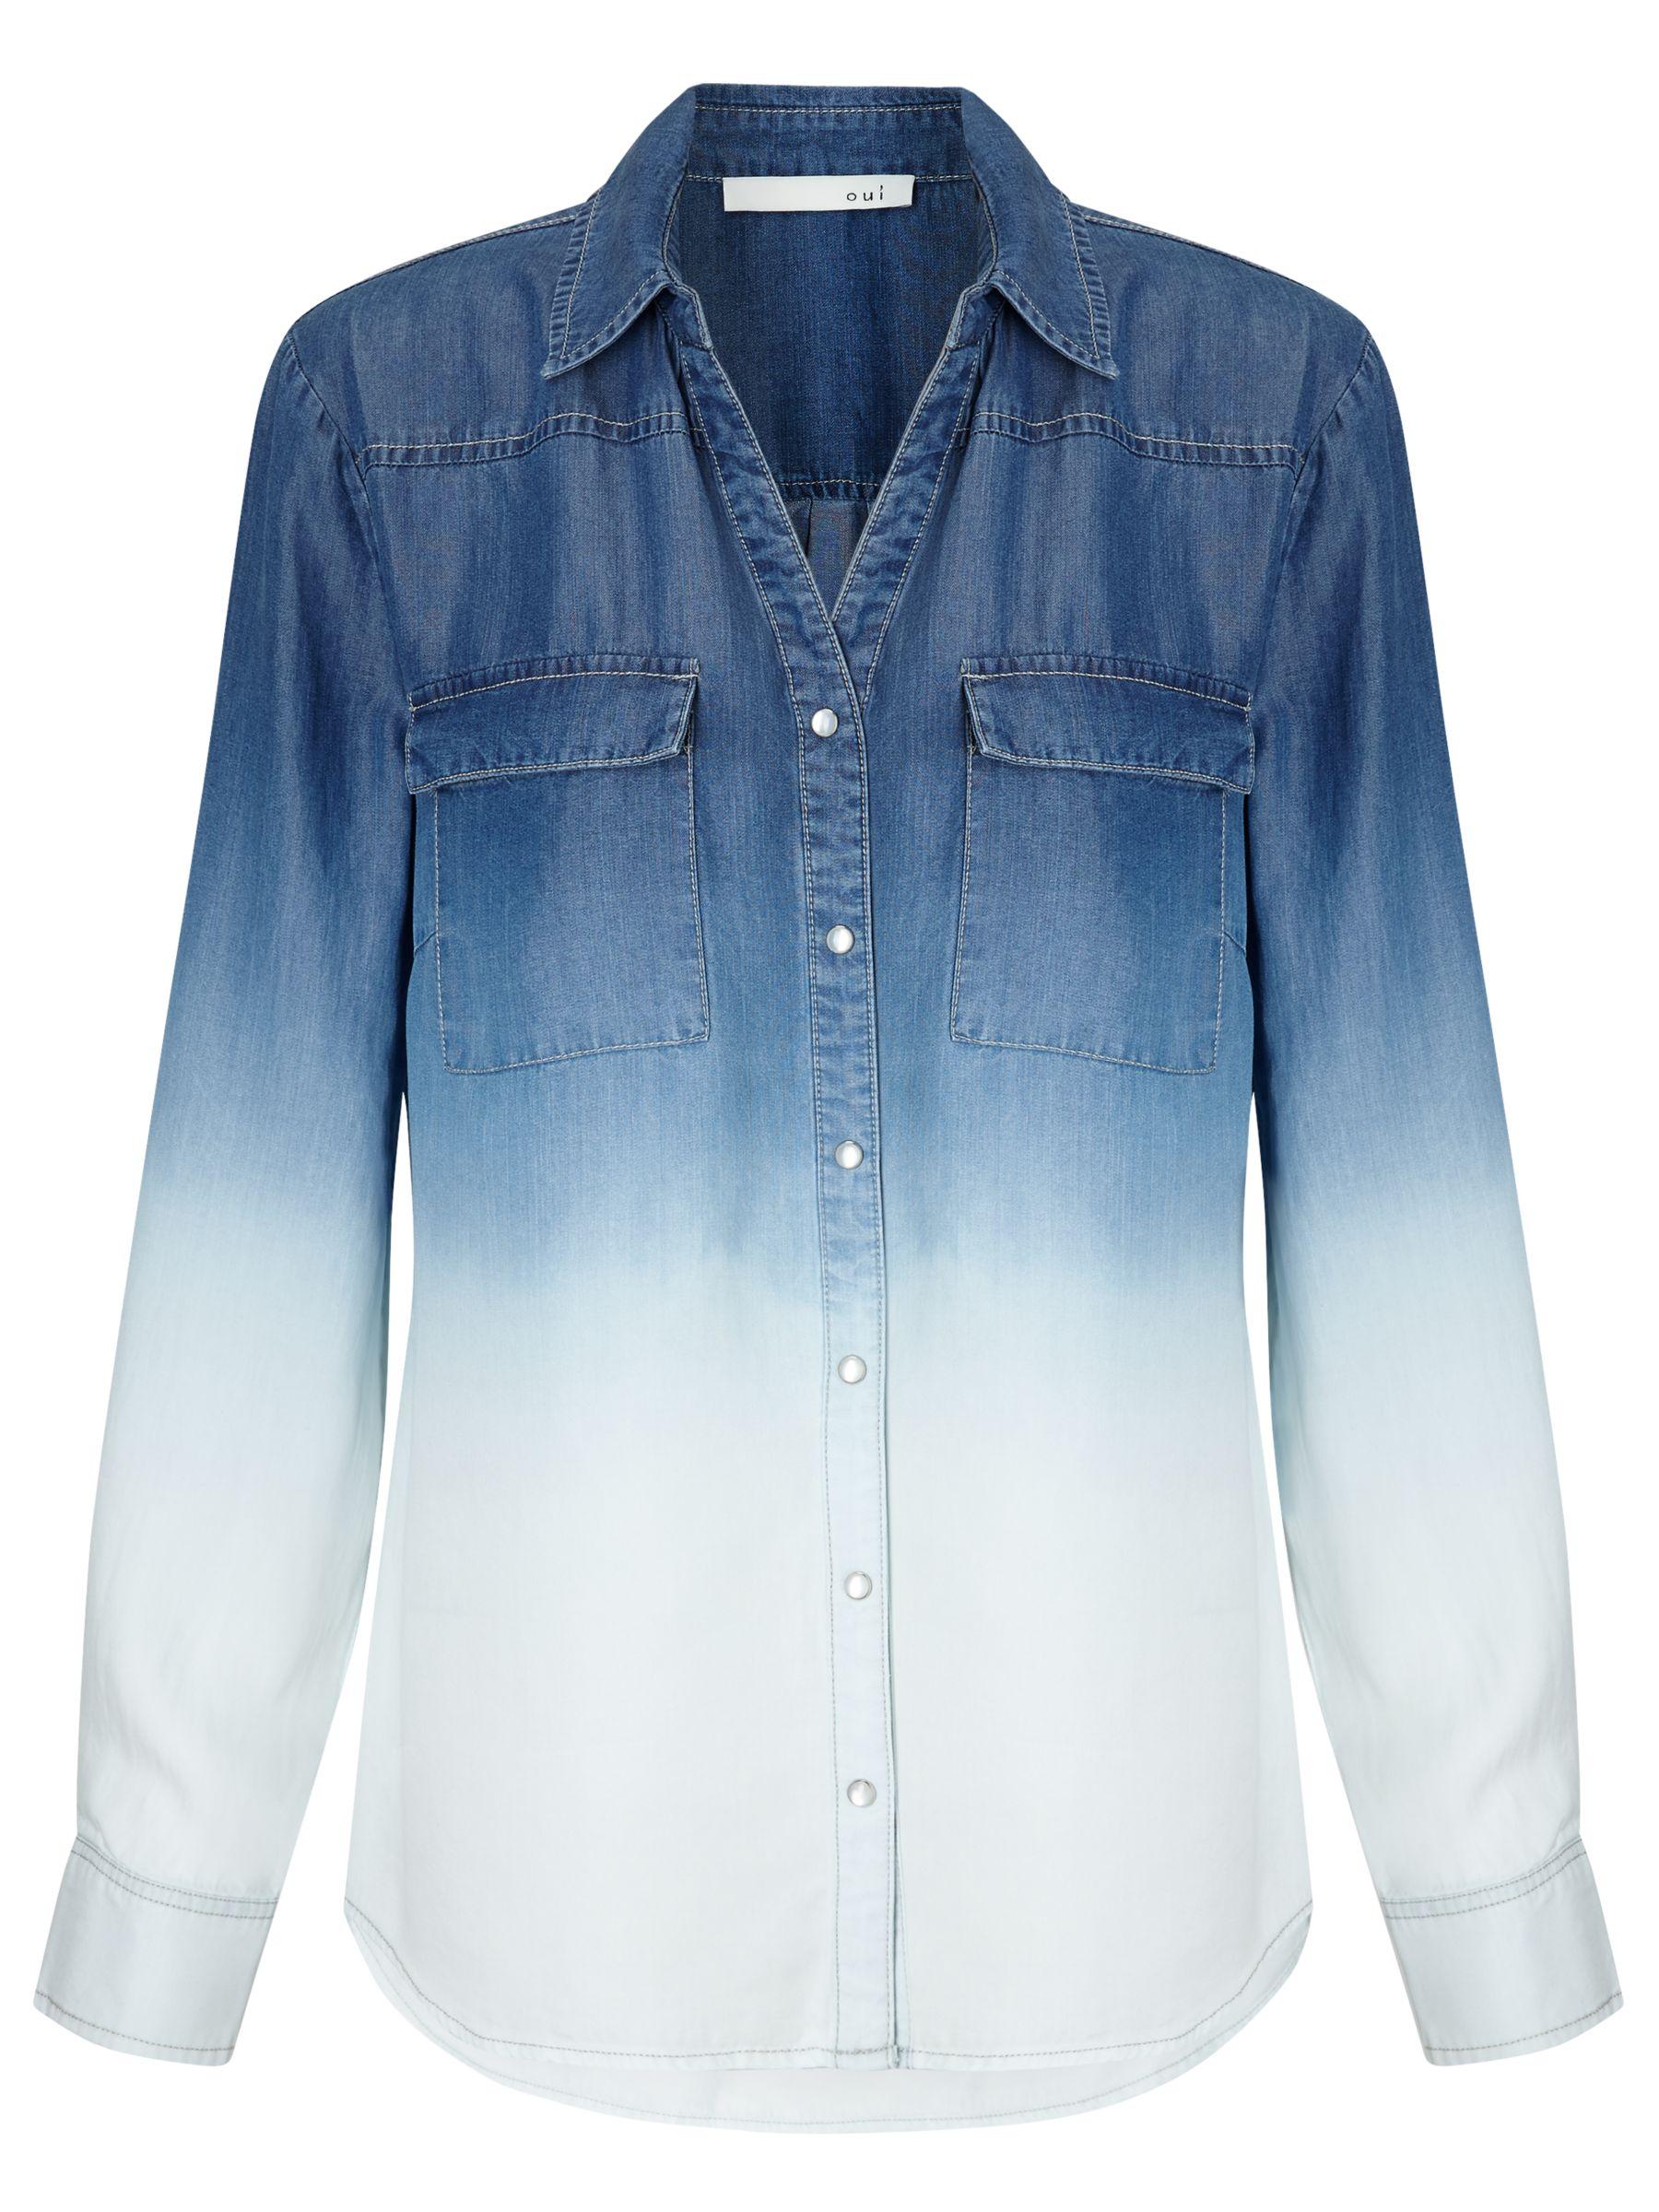 Oui Oui Ombre Shirt, Blue/White